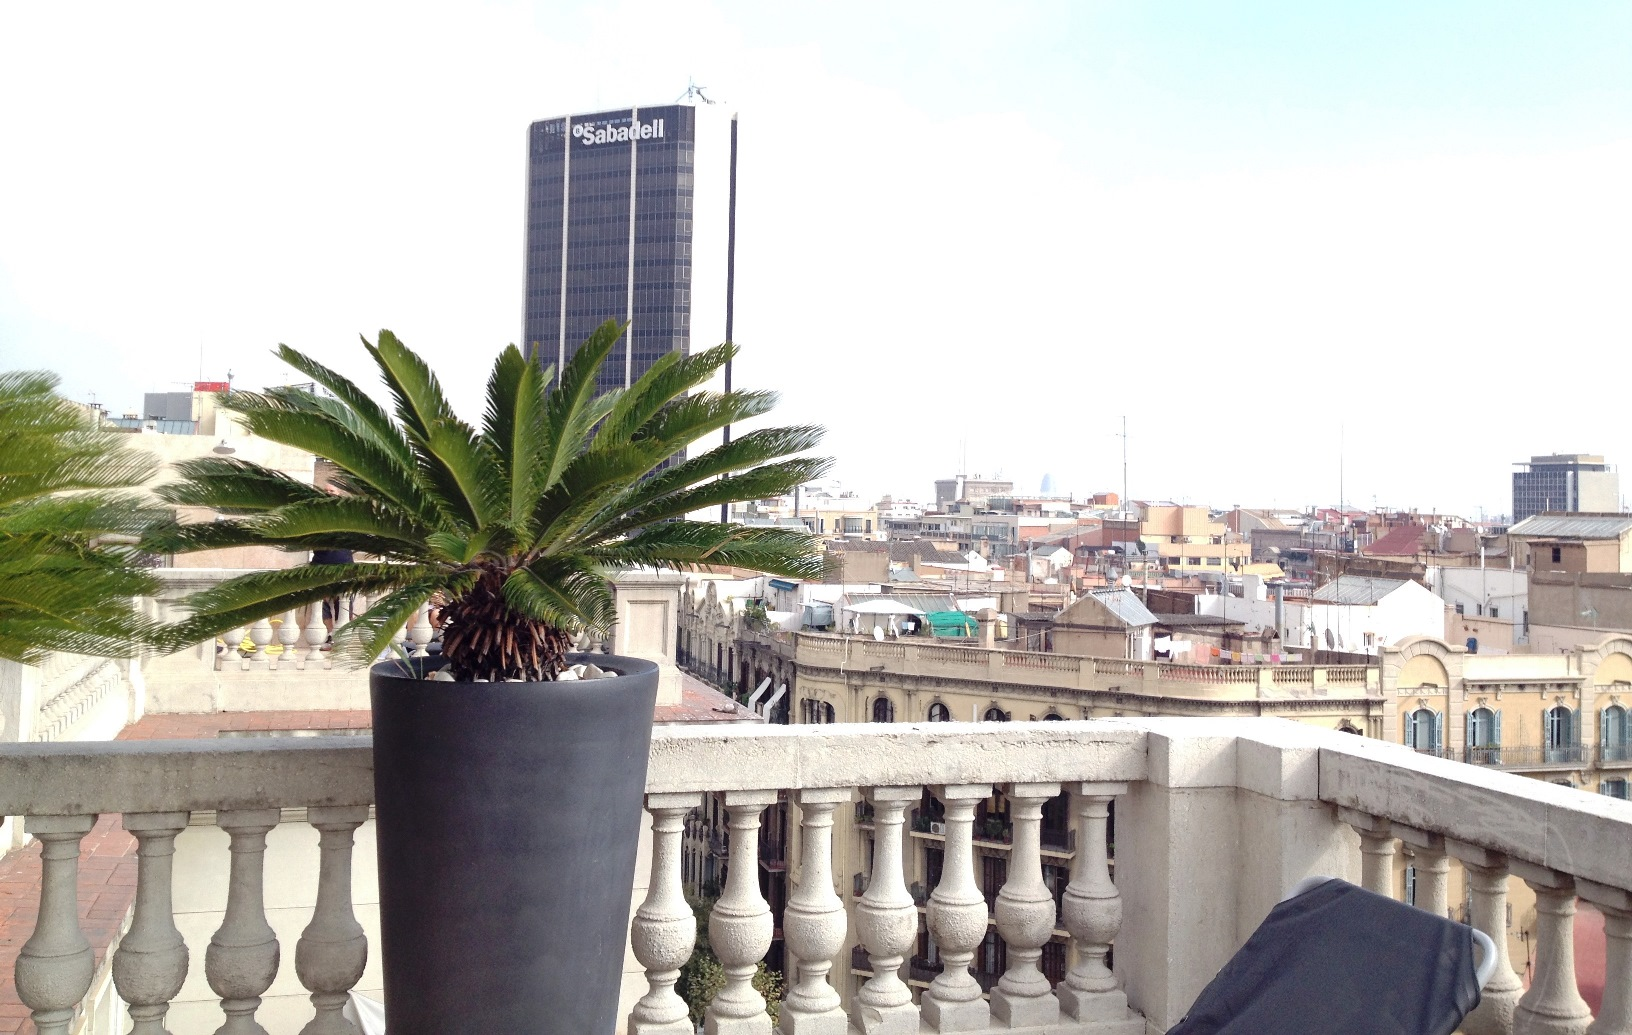 Astoria-hotel-barcelona-travelgrip- (2)